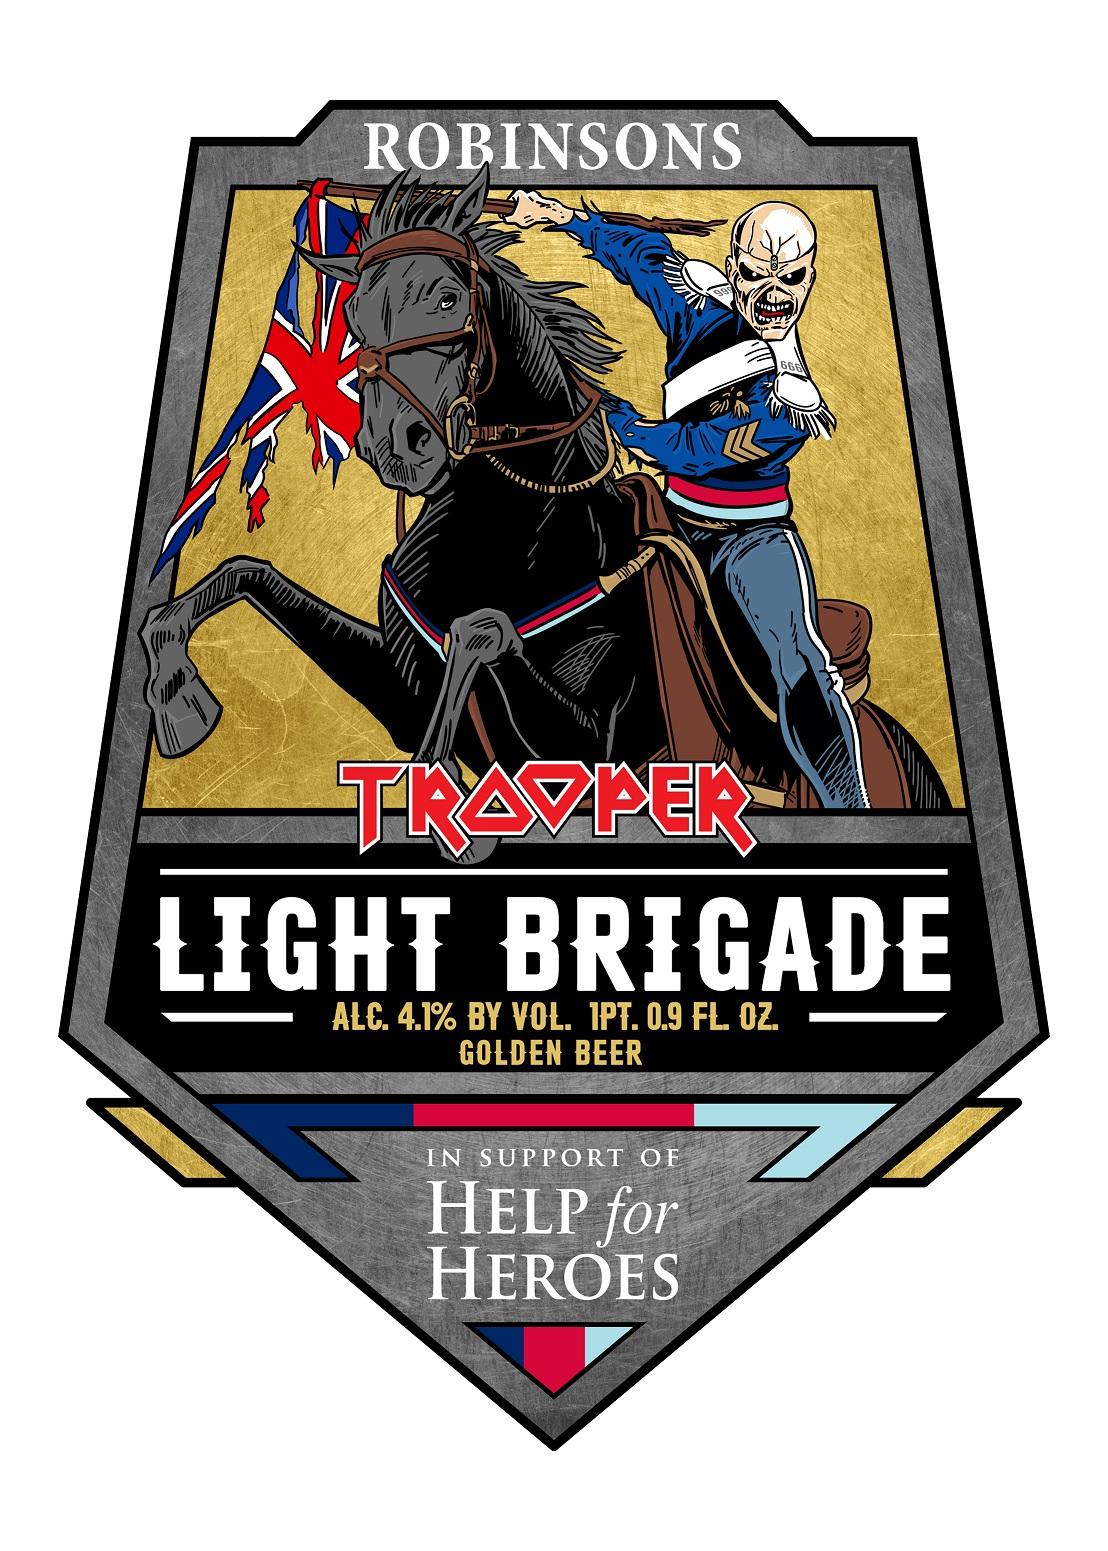 TROOPER Light Brigade Robinsons Brewery Iron Maiden